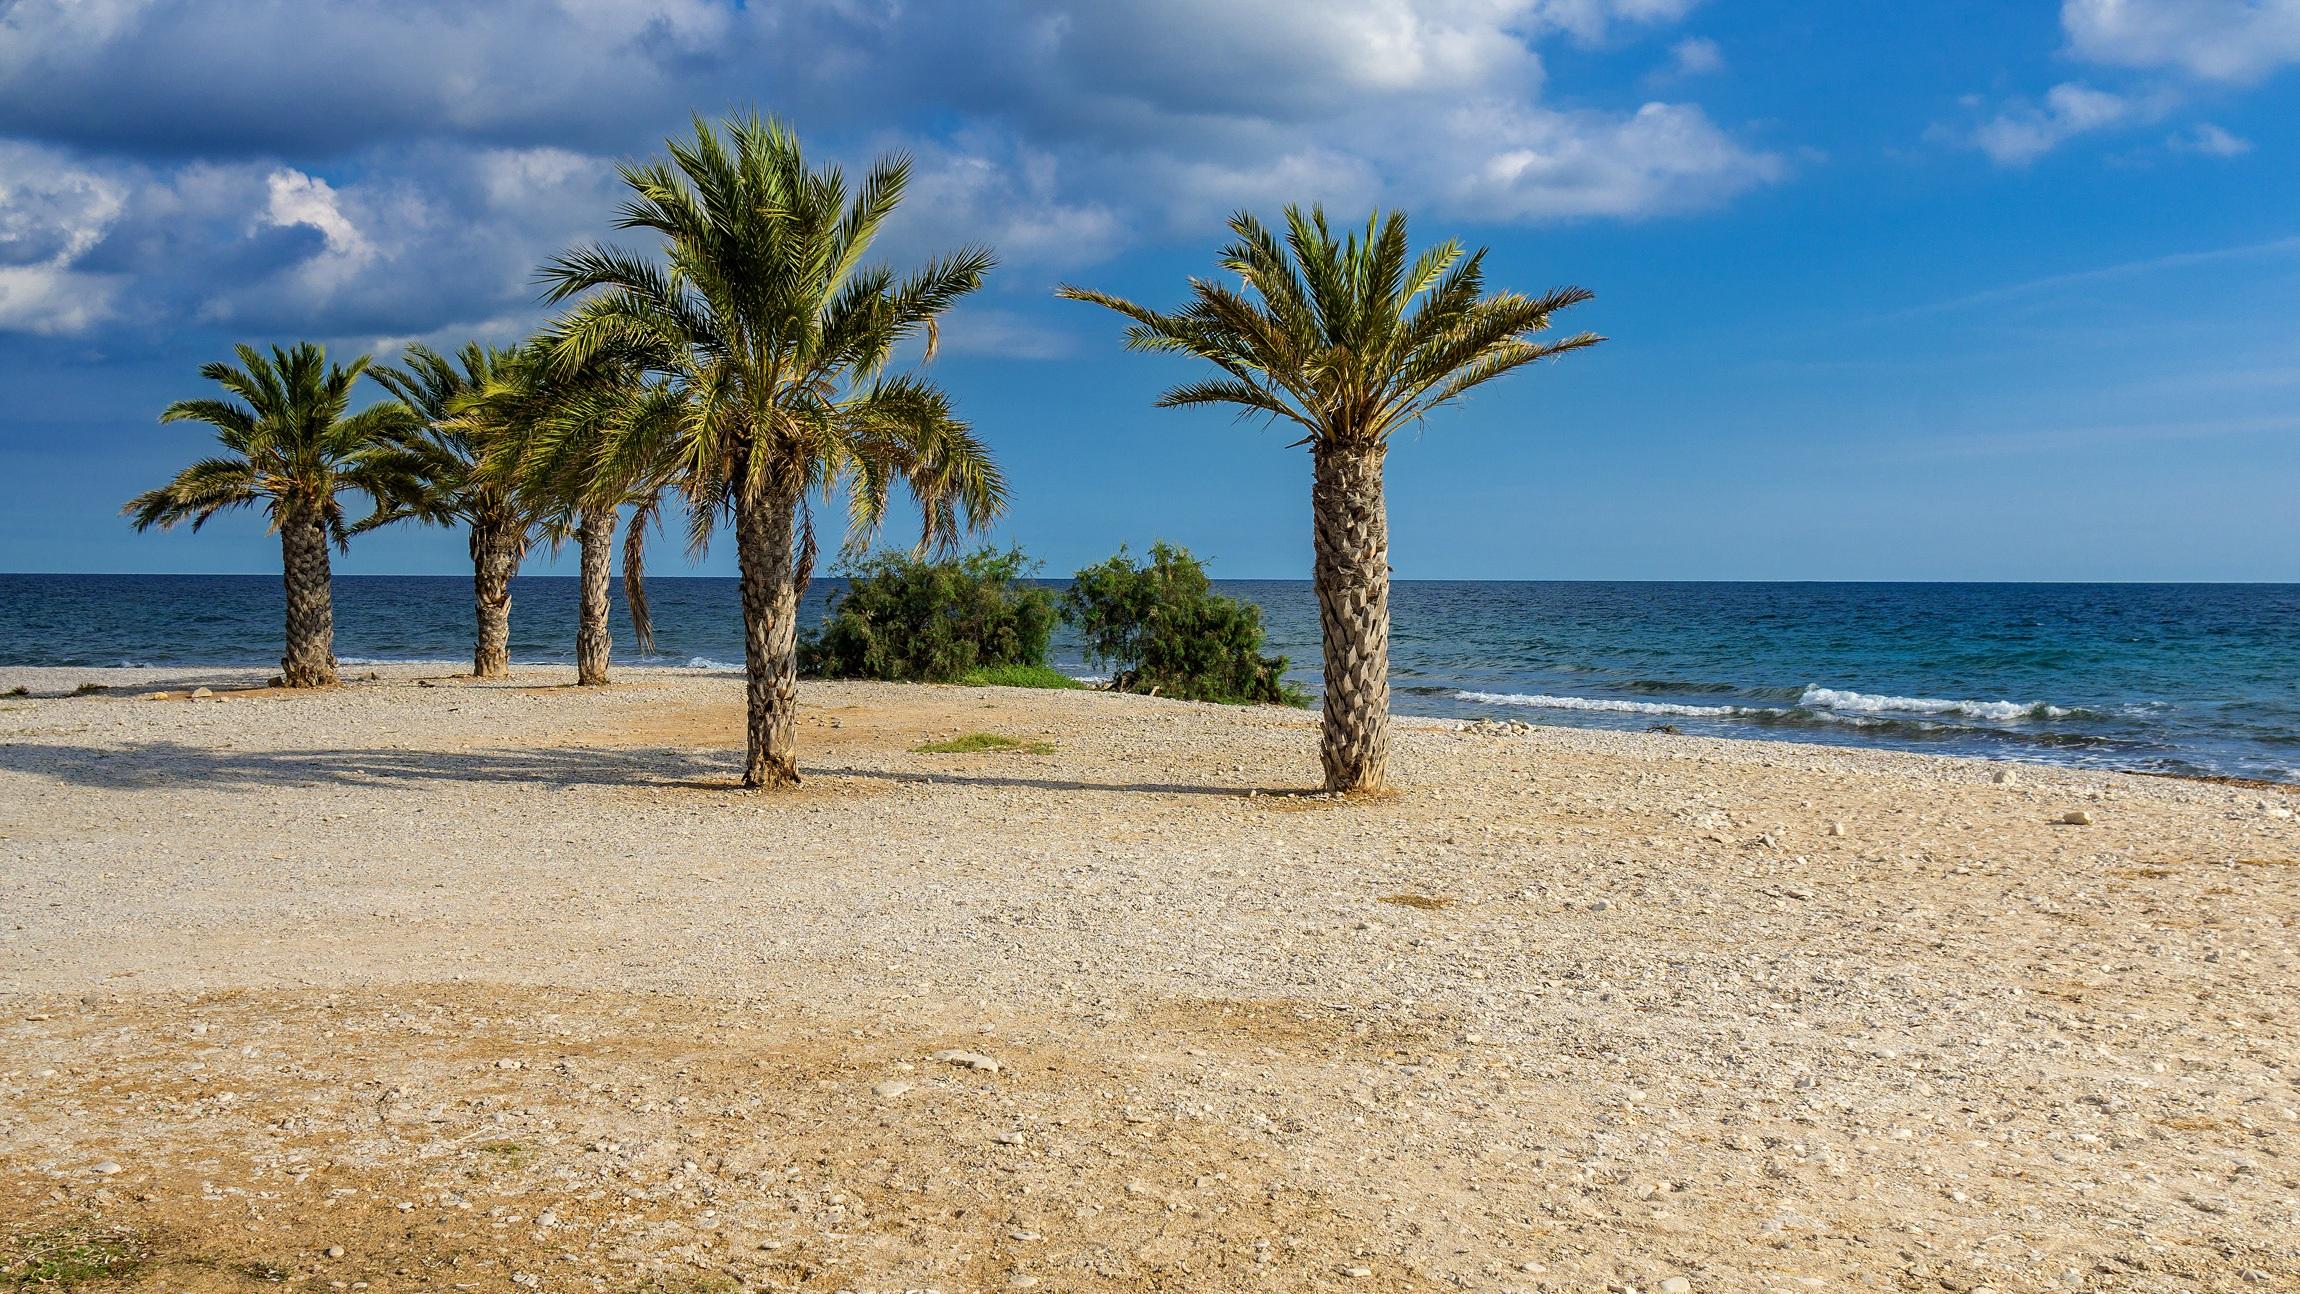 Free Images Landscape Sea Coast Nature Ocean Horizon Plant Sky Sun Palm Tree Shore View Vacation Holiday Tourism Spain Caribbean